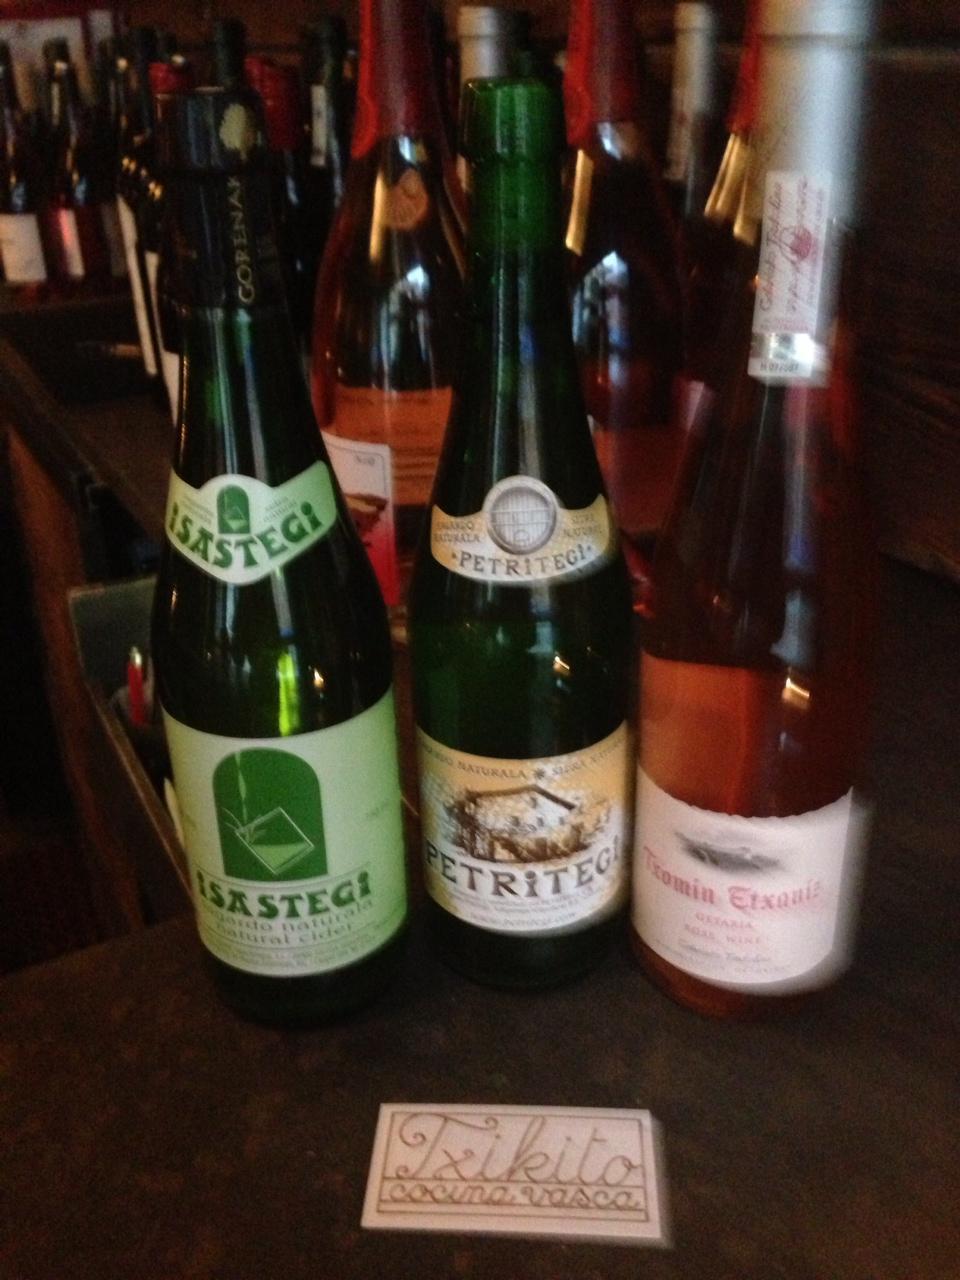 NYC's Txikito serves a variety of  Basque wines